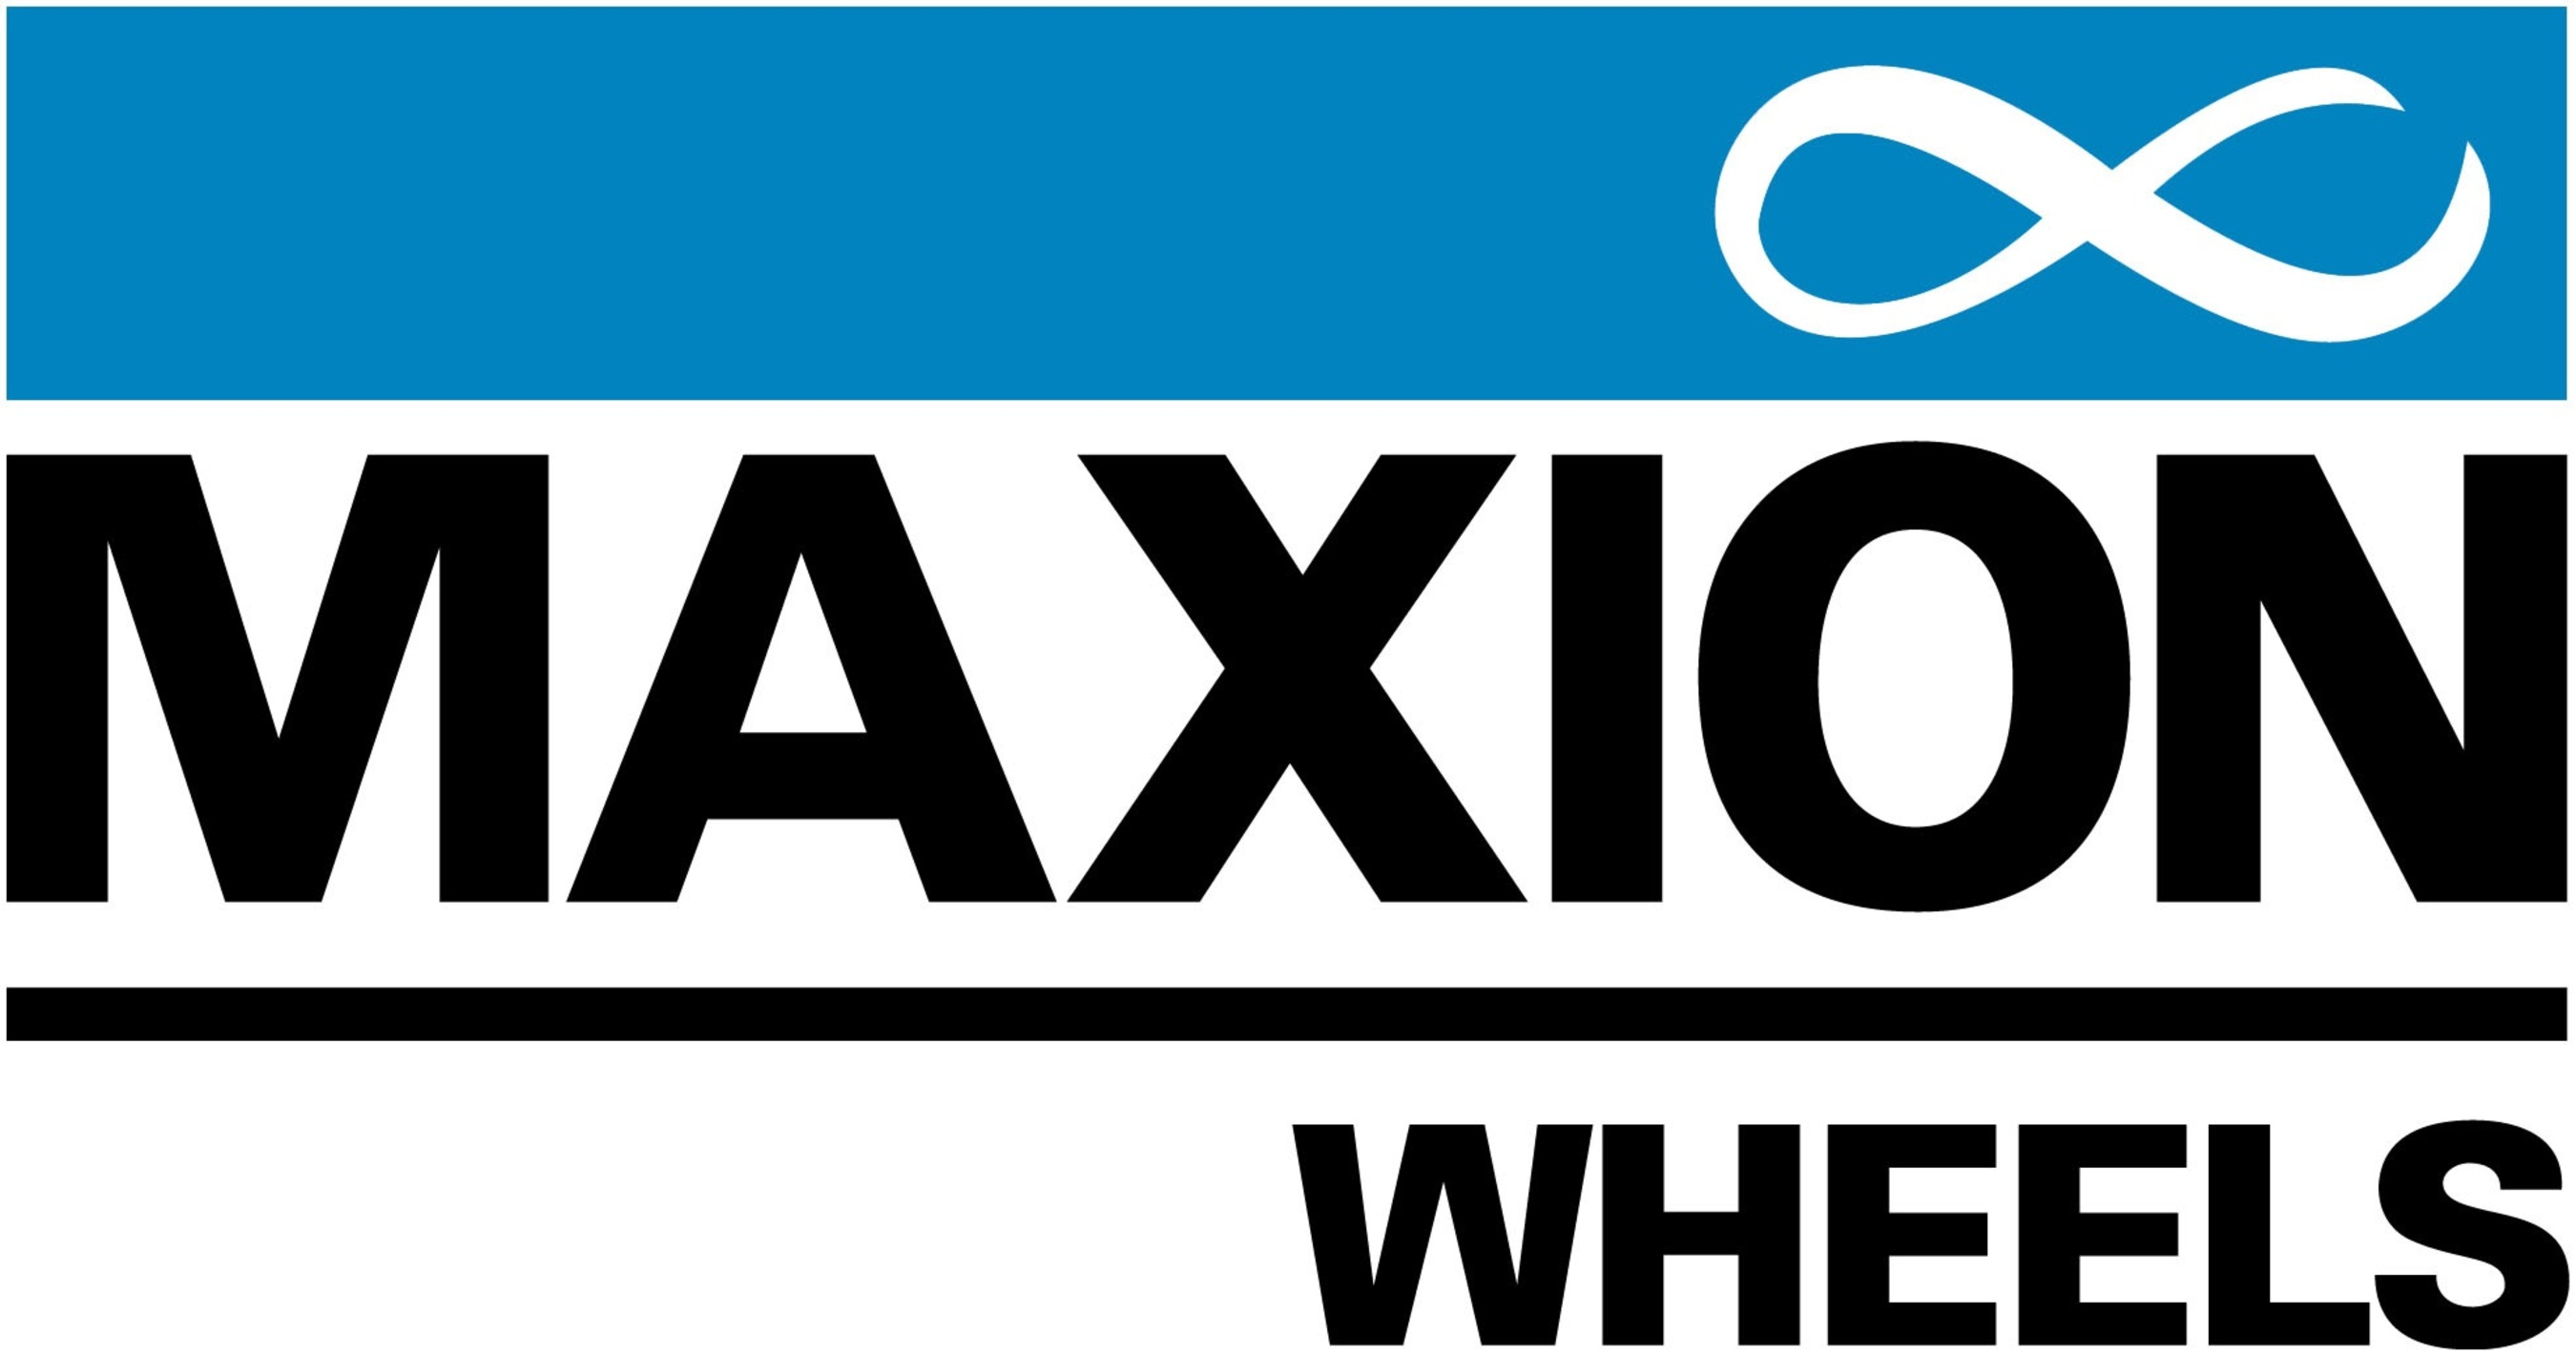 Maxion Wheels participera au salon Automechanika à Dubaï